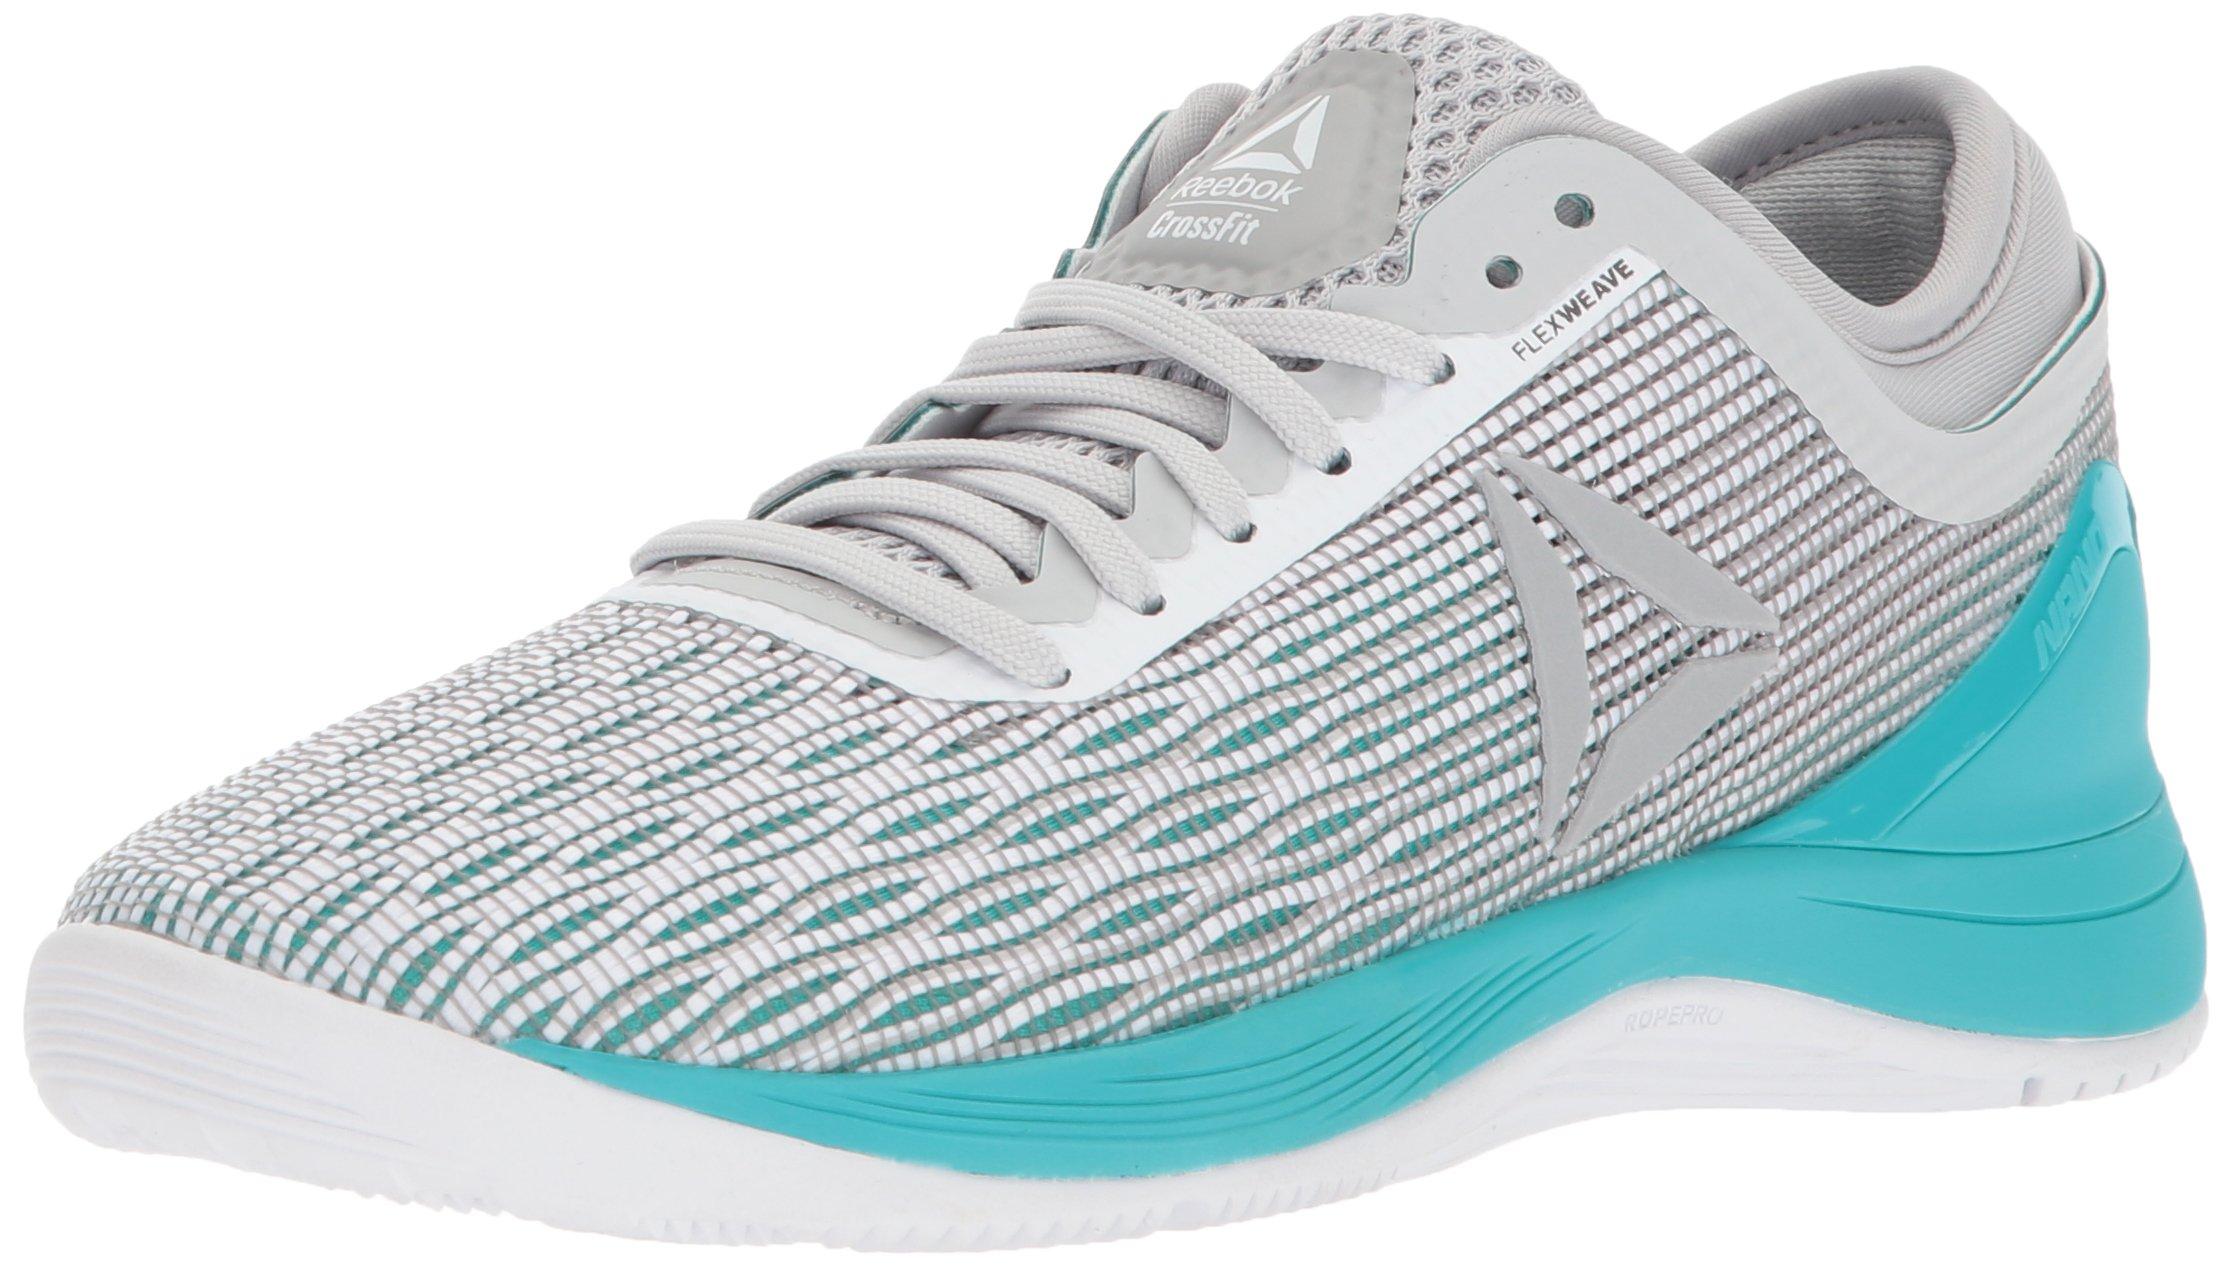 Reebok Women's CROSSFIT Nano 8.0 Flexweave Cross Trainer, White/Stark Grey/Grey/Classic White/Turquoise, 7 M US